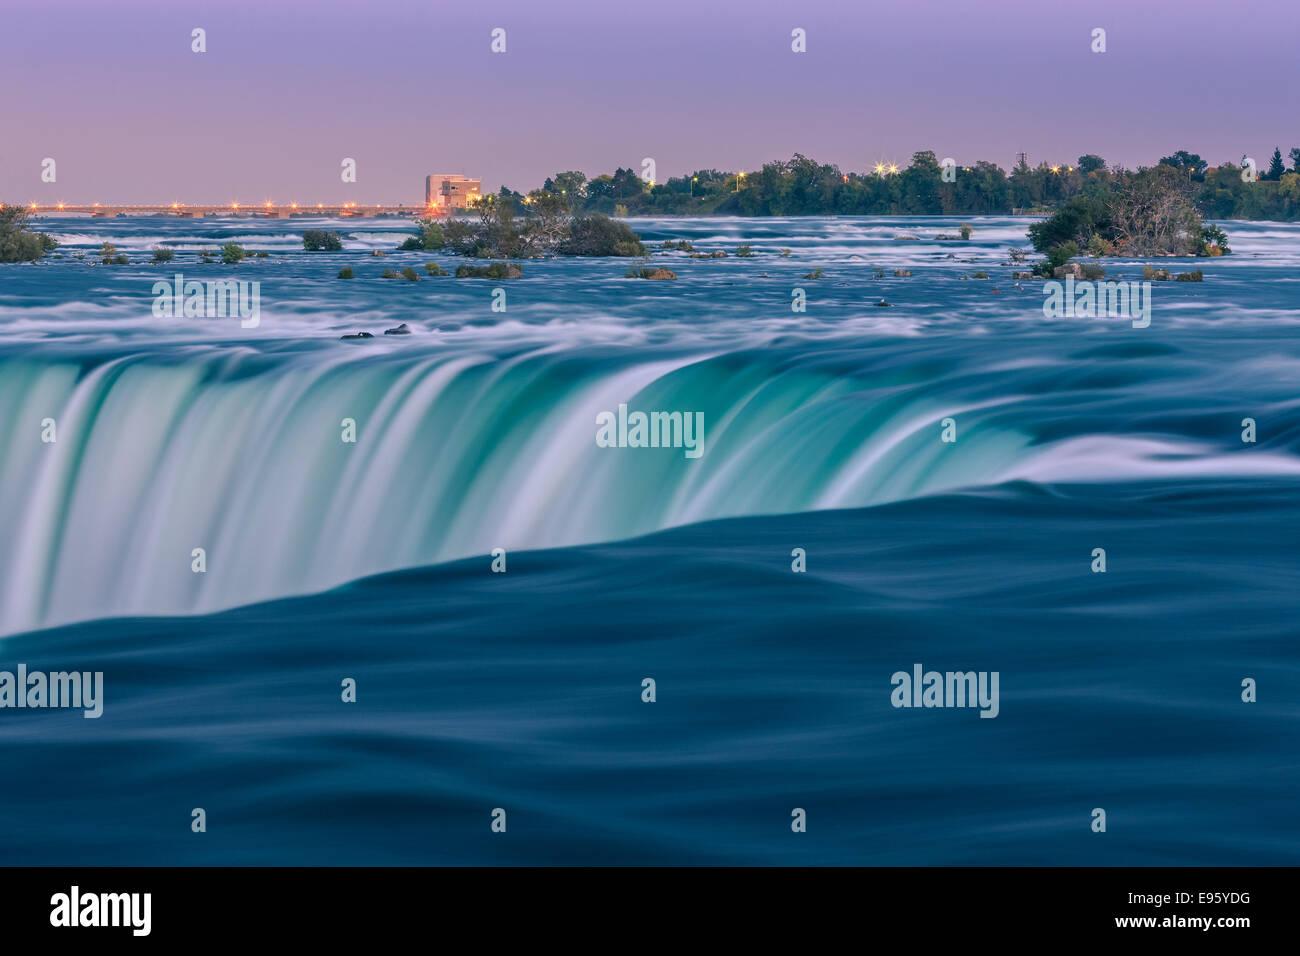 Horseshoe Falls, Teil von Niagara Falls, Ontario, Kanada. Stockbild